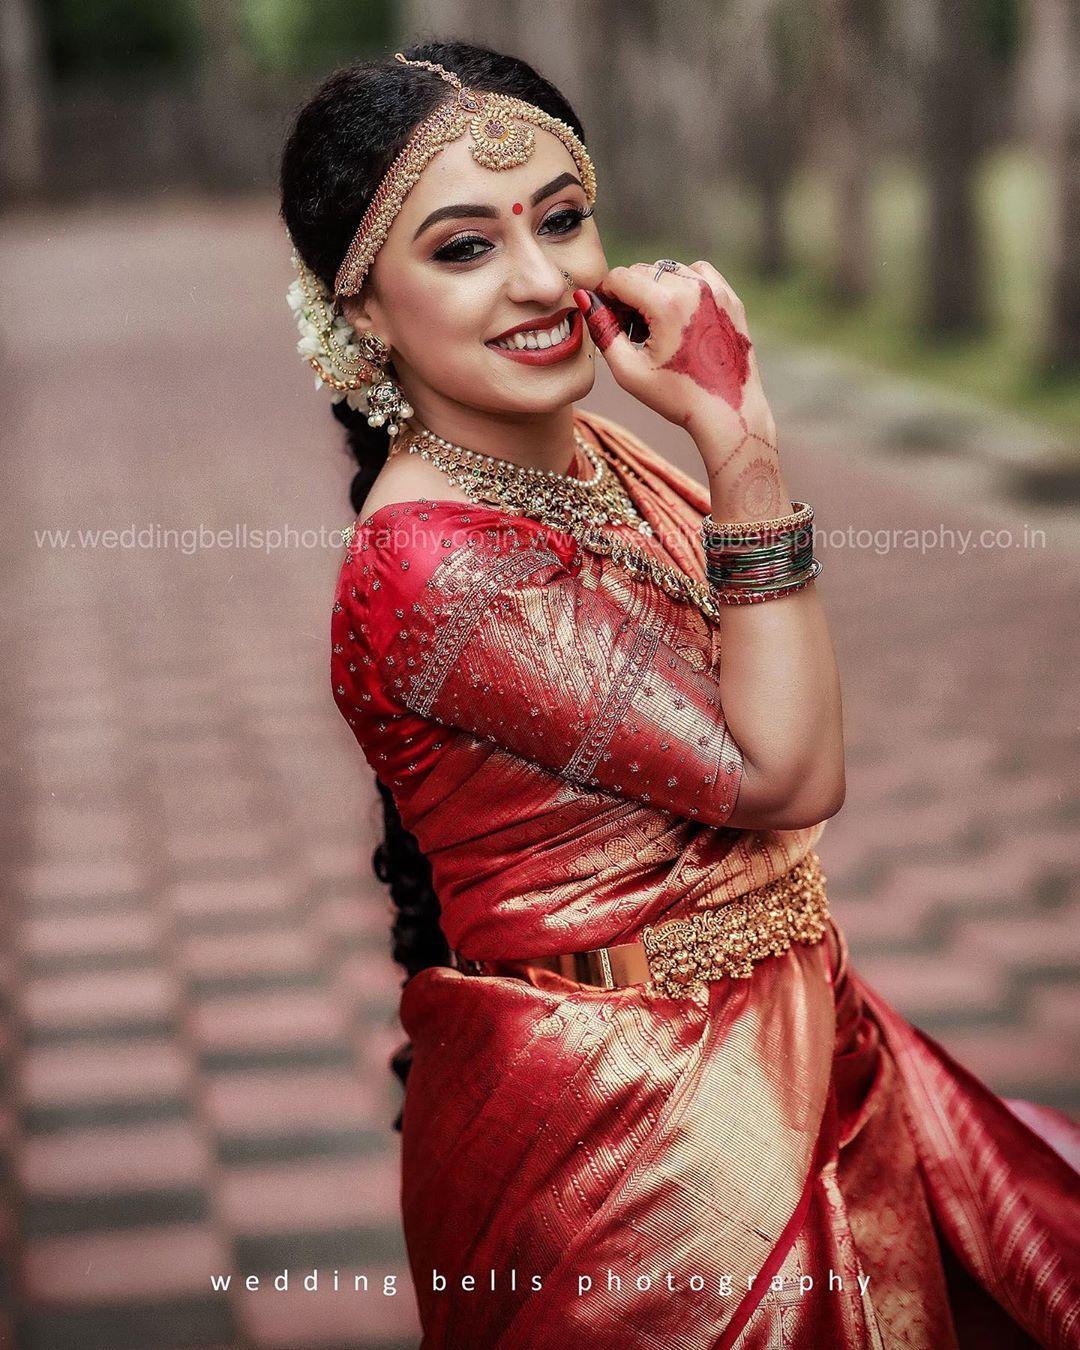 "Photo of WeddingBellsPhotography & Events On Instagram: ""Pearlish Wedding ♥ ️ ♥ ️ ♥ ️ pe @pearlemaany @srinish_aravind || Mangalyam tantunanena mama jeevana hetuna: kanthe badhnami subhage twam jeeva… """